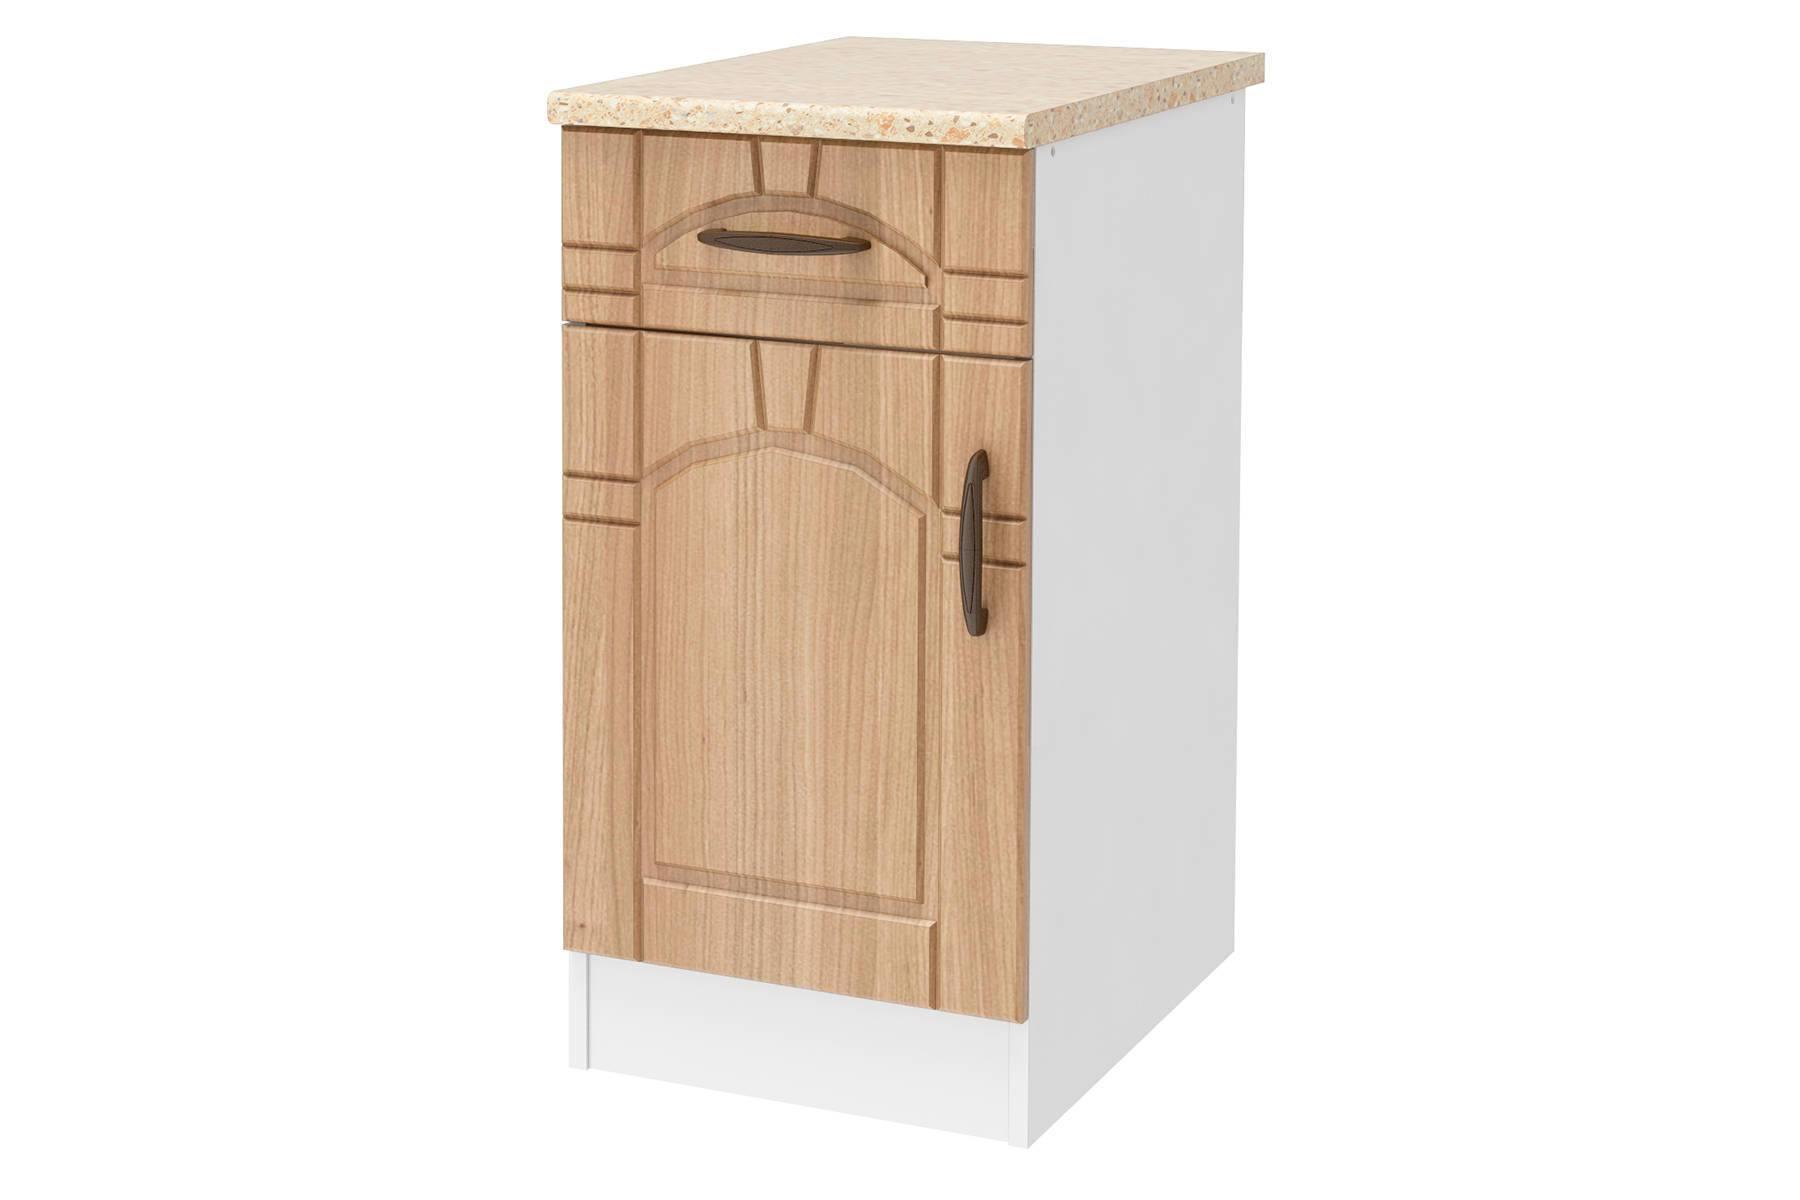 Шкаф напольный Мальпело СТЛ.144.04